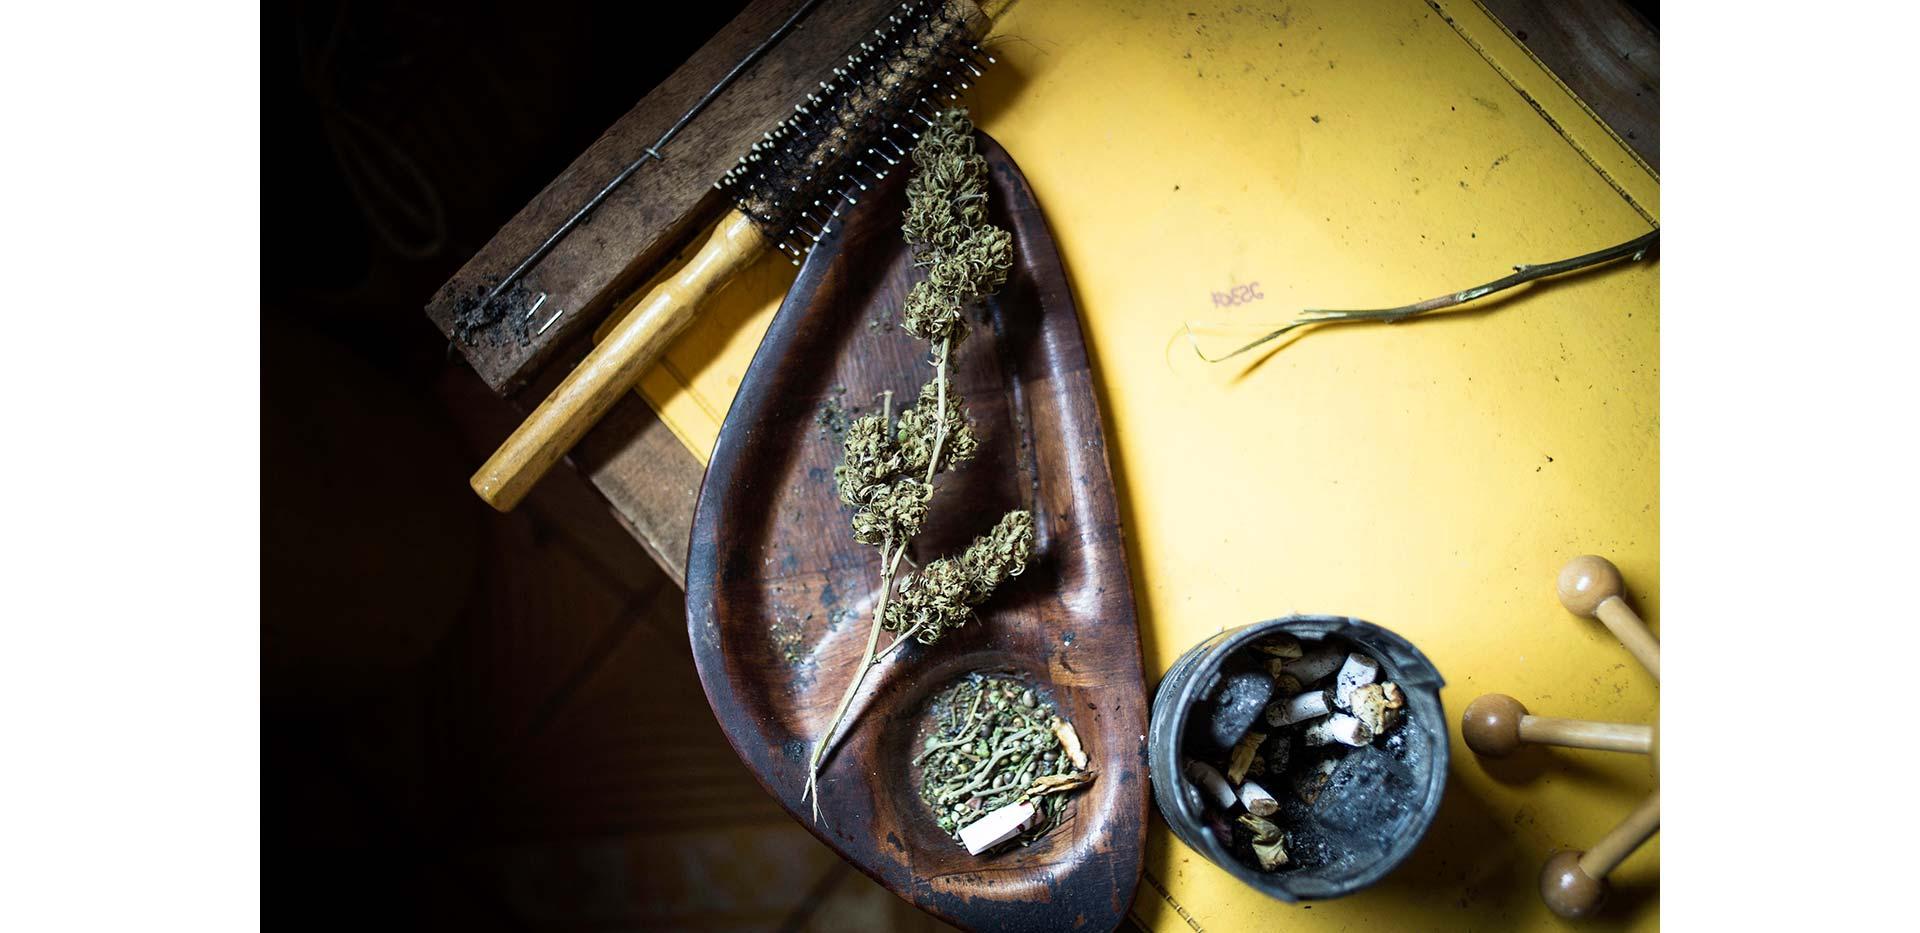 expocannabis_3_caja